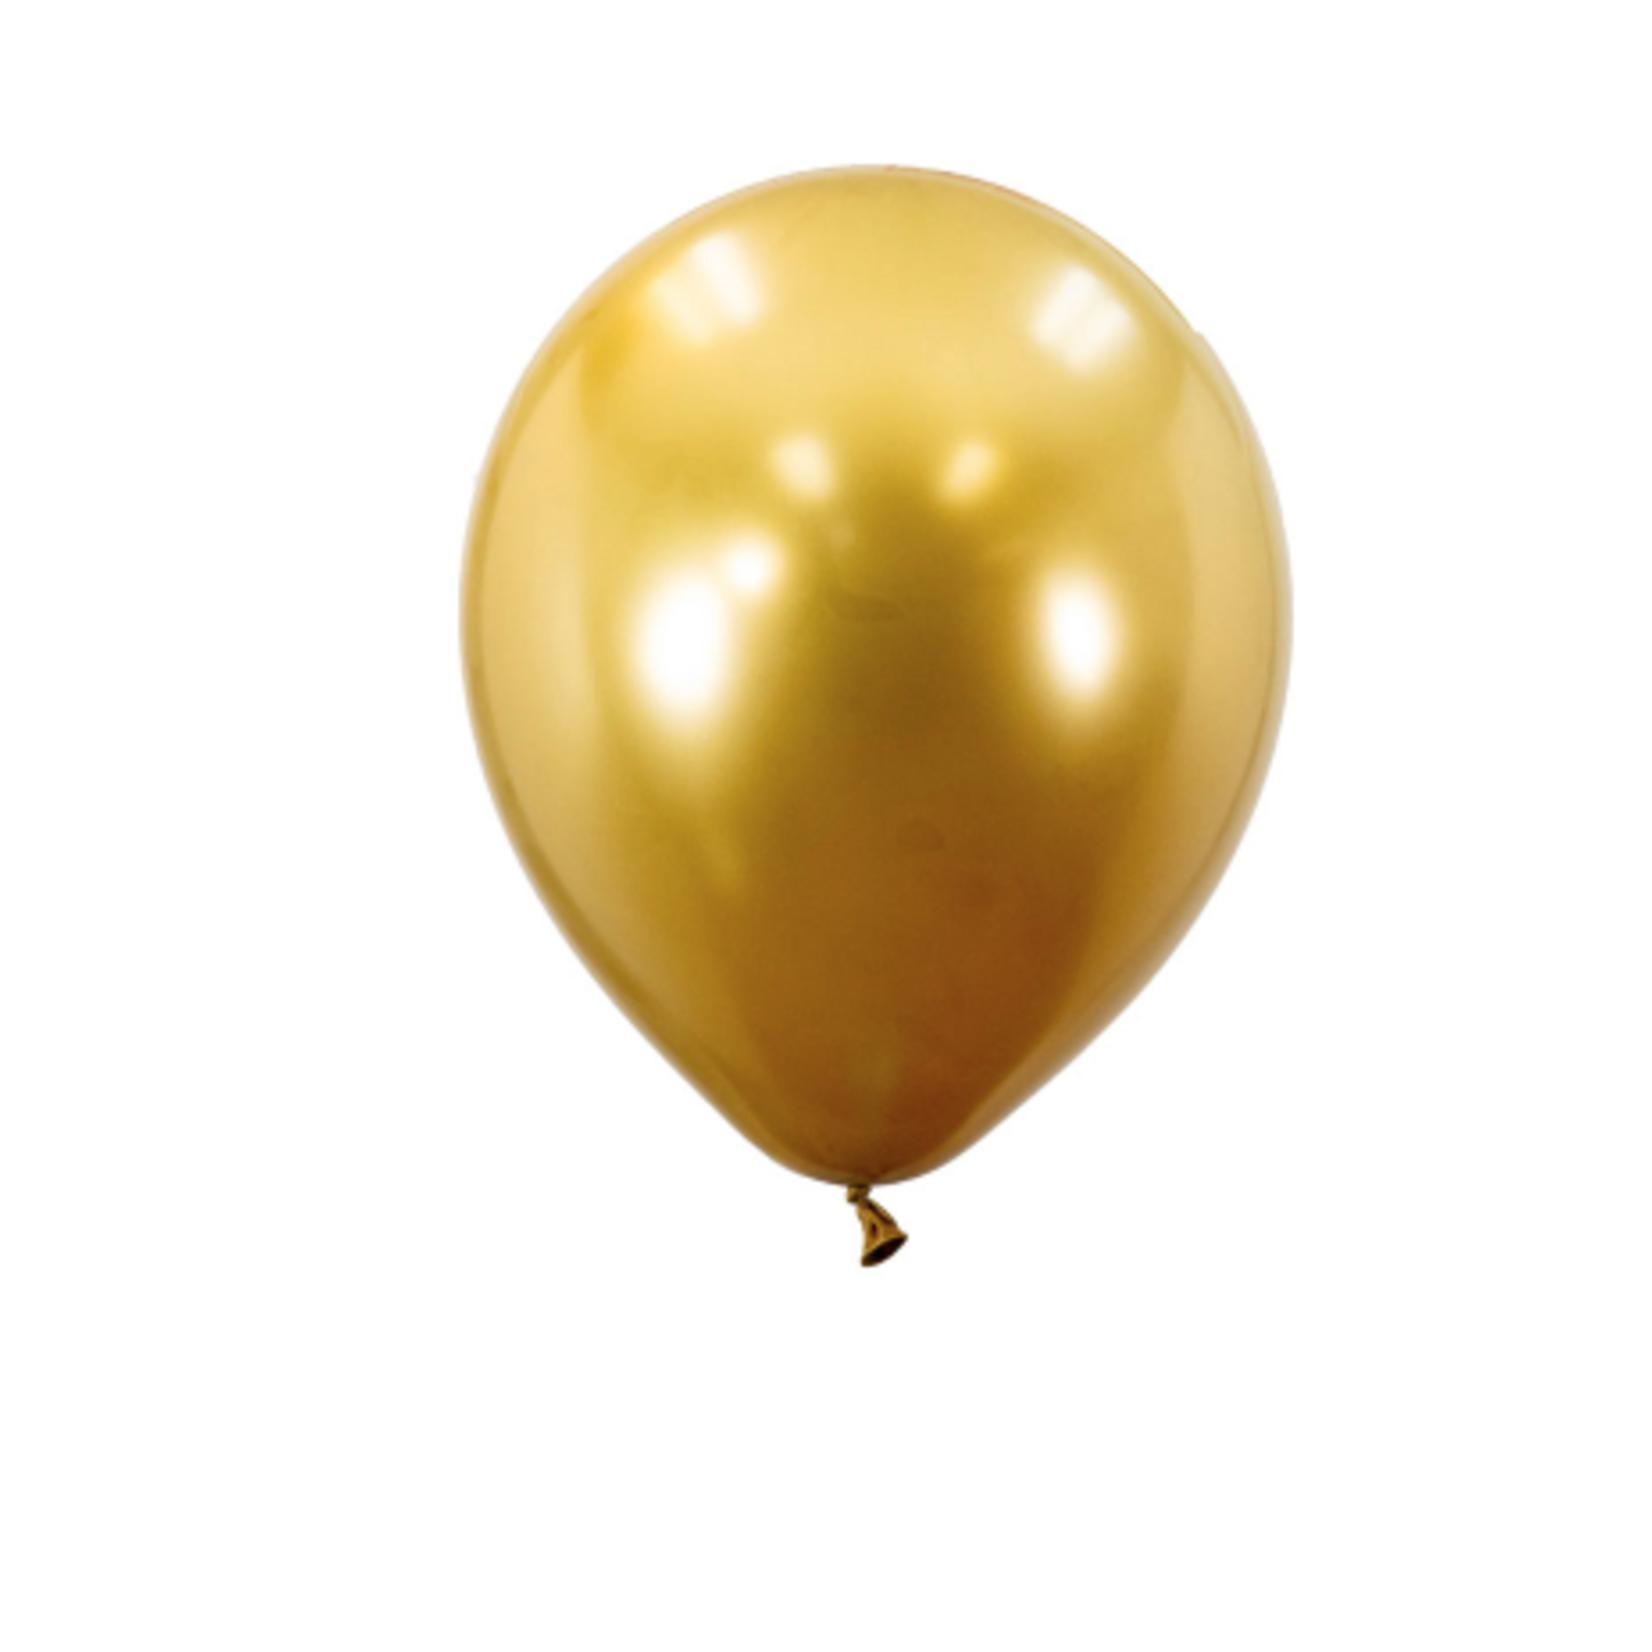 12'' CHROME BALLOON, 50PCS PACK, GOLD